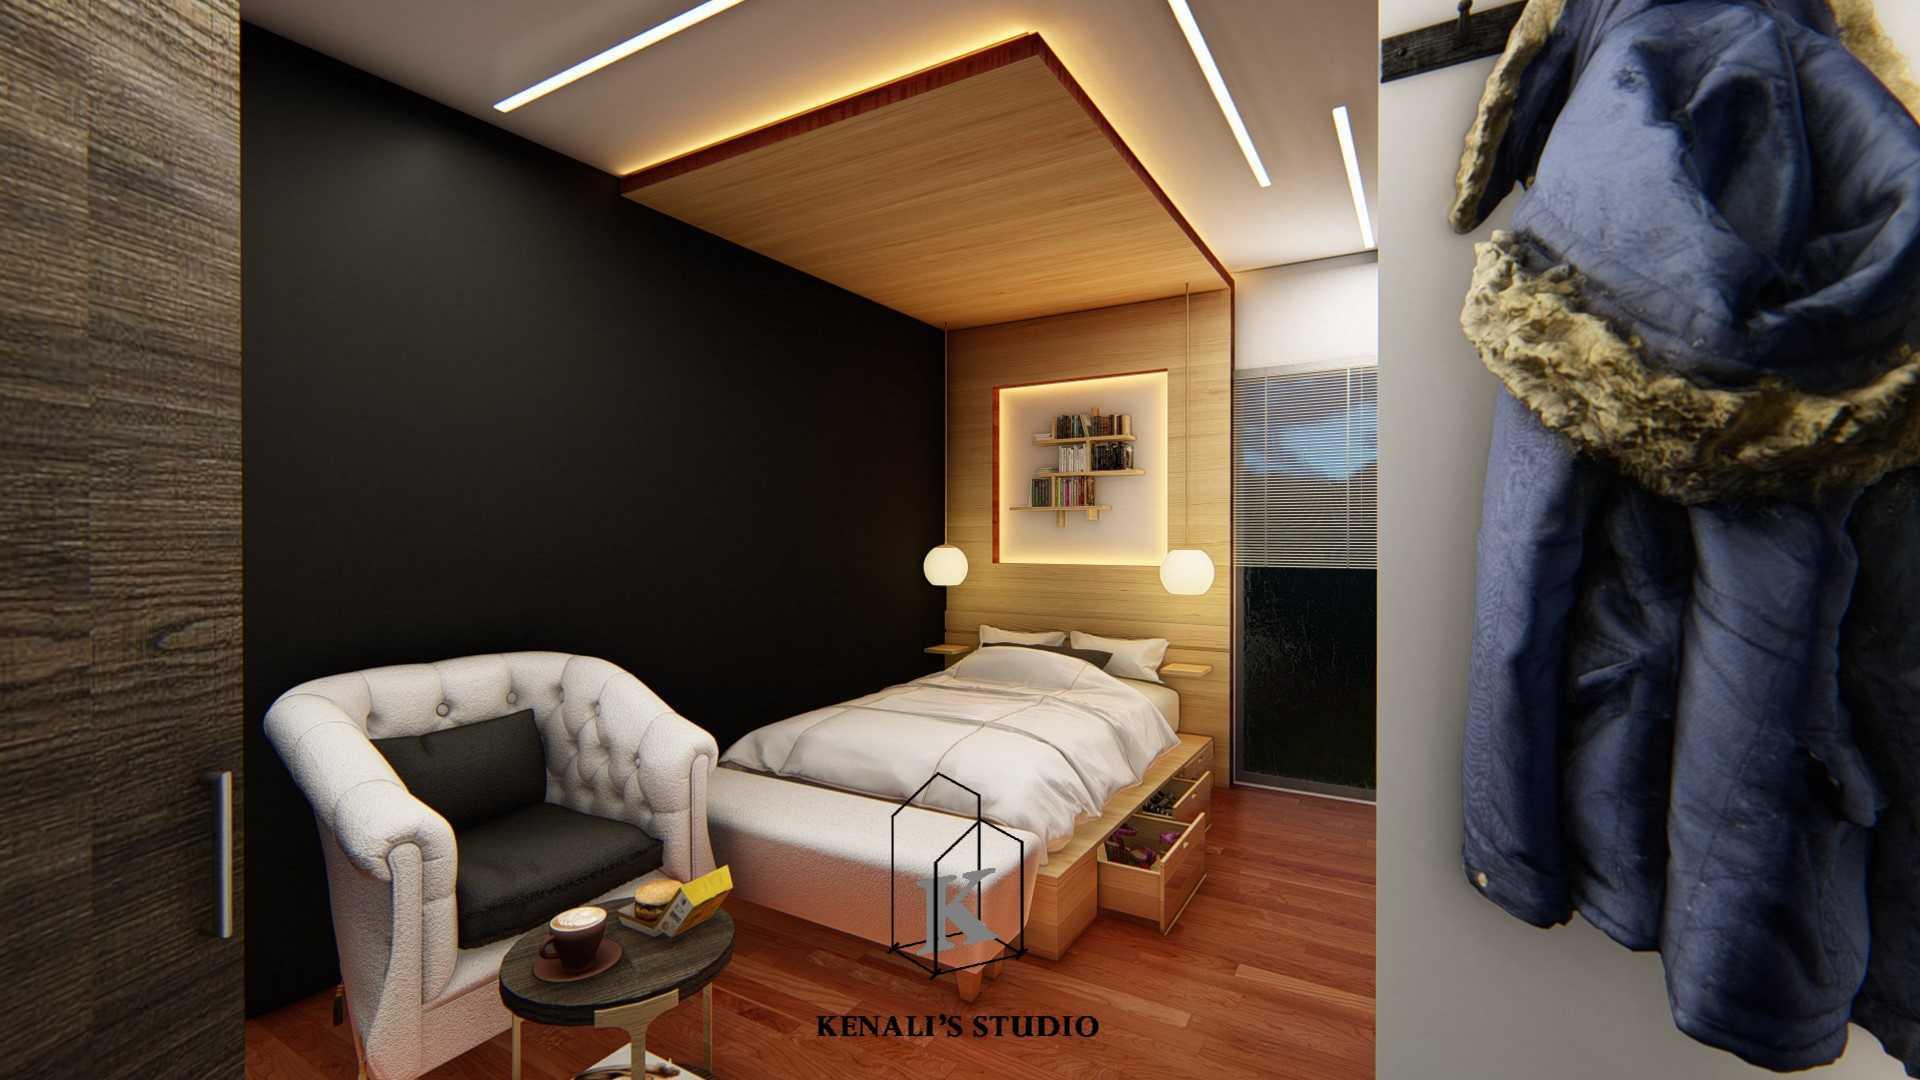 Kenali's Studio Project : Lowlit Bedroom Italia Italia Kenalis-Studio-Project-Lowlit-Bedroom  72925